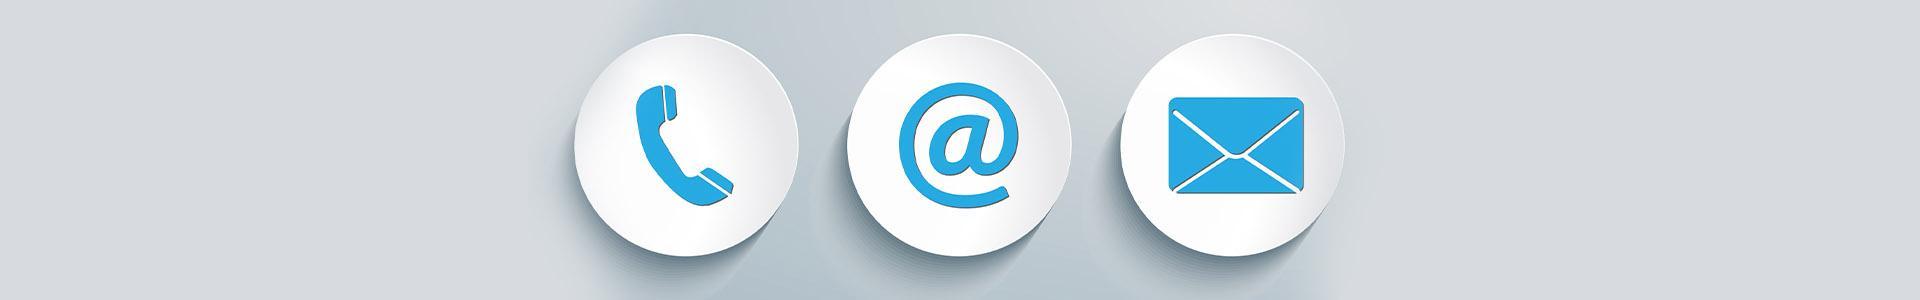 Ikony telefonu, maila i koperty